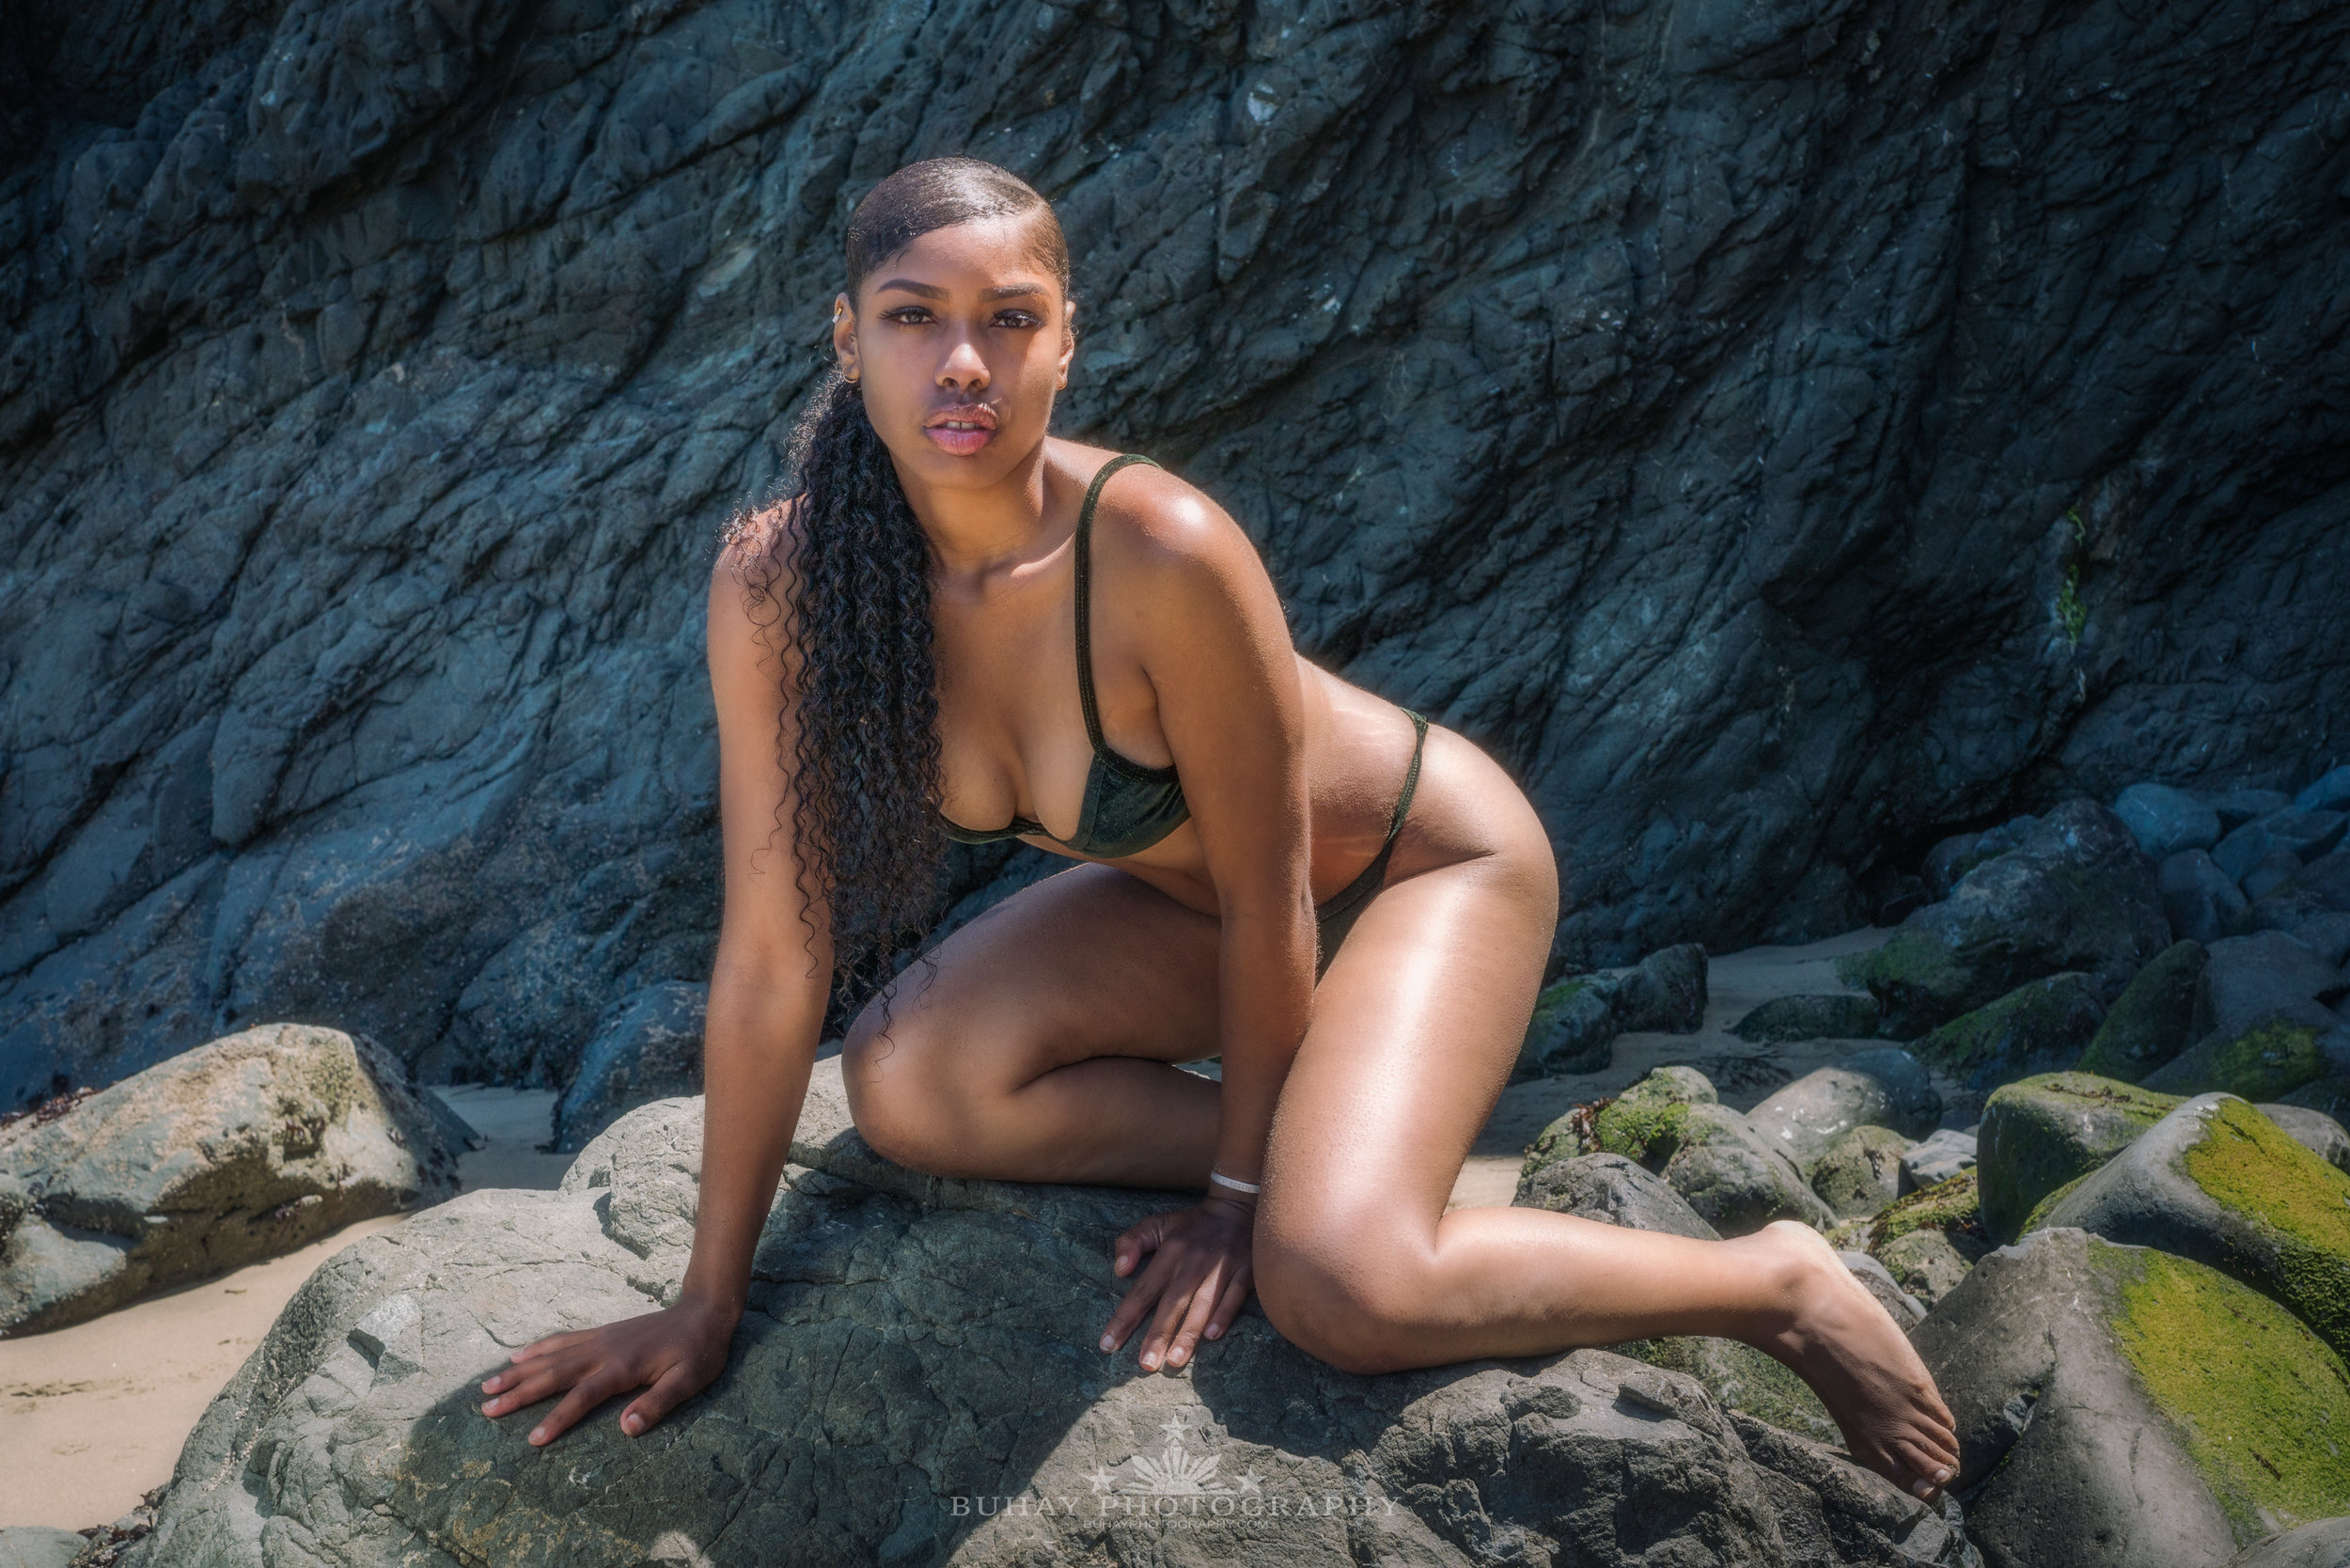 Buhay Photography 2018